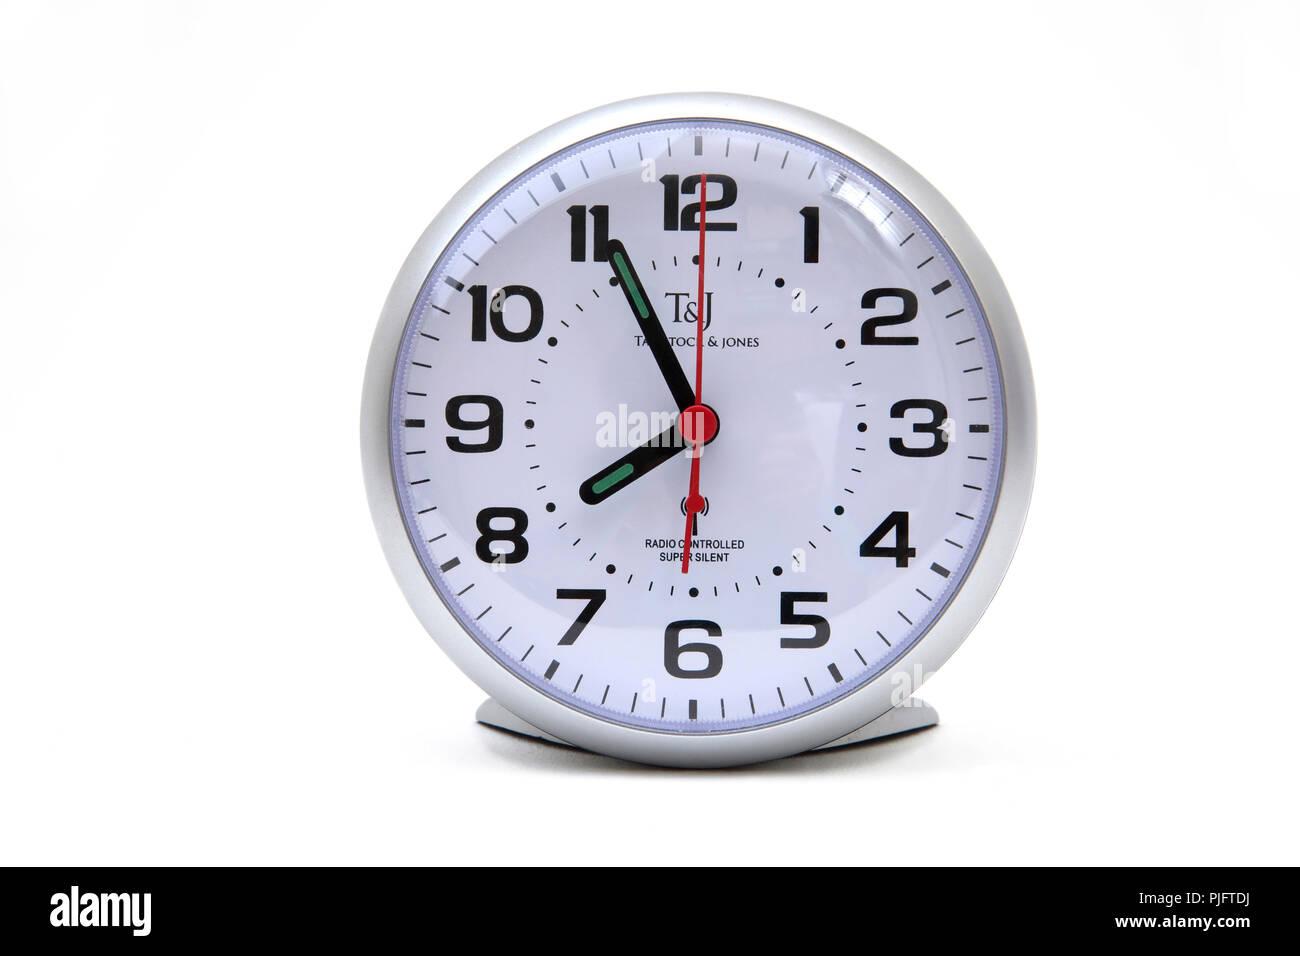 Tavistock & Jones Radio Controlled Alarm Clock time 3.55 - Stock Image